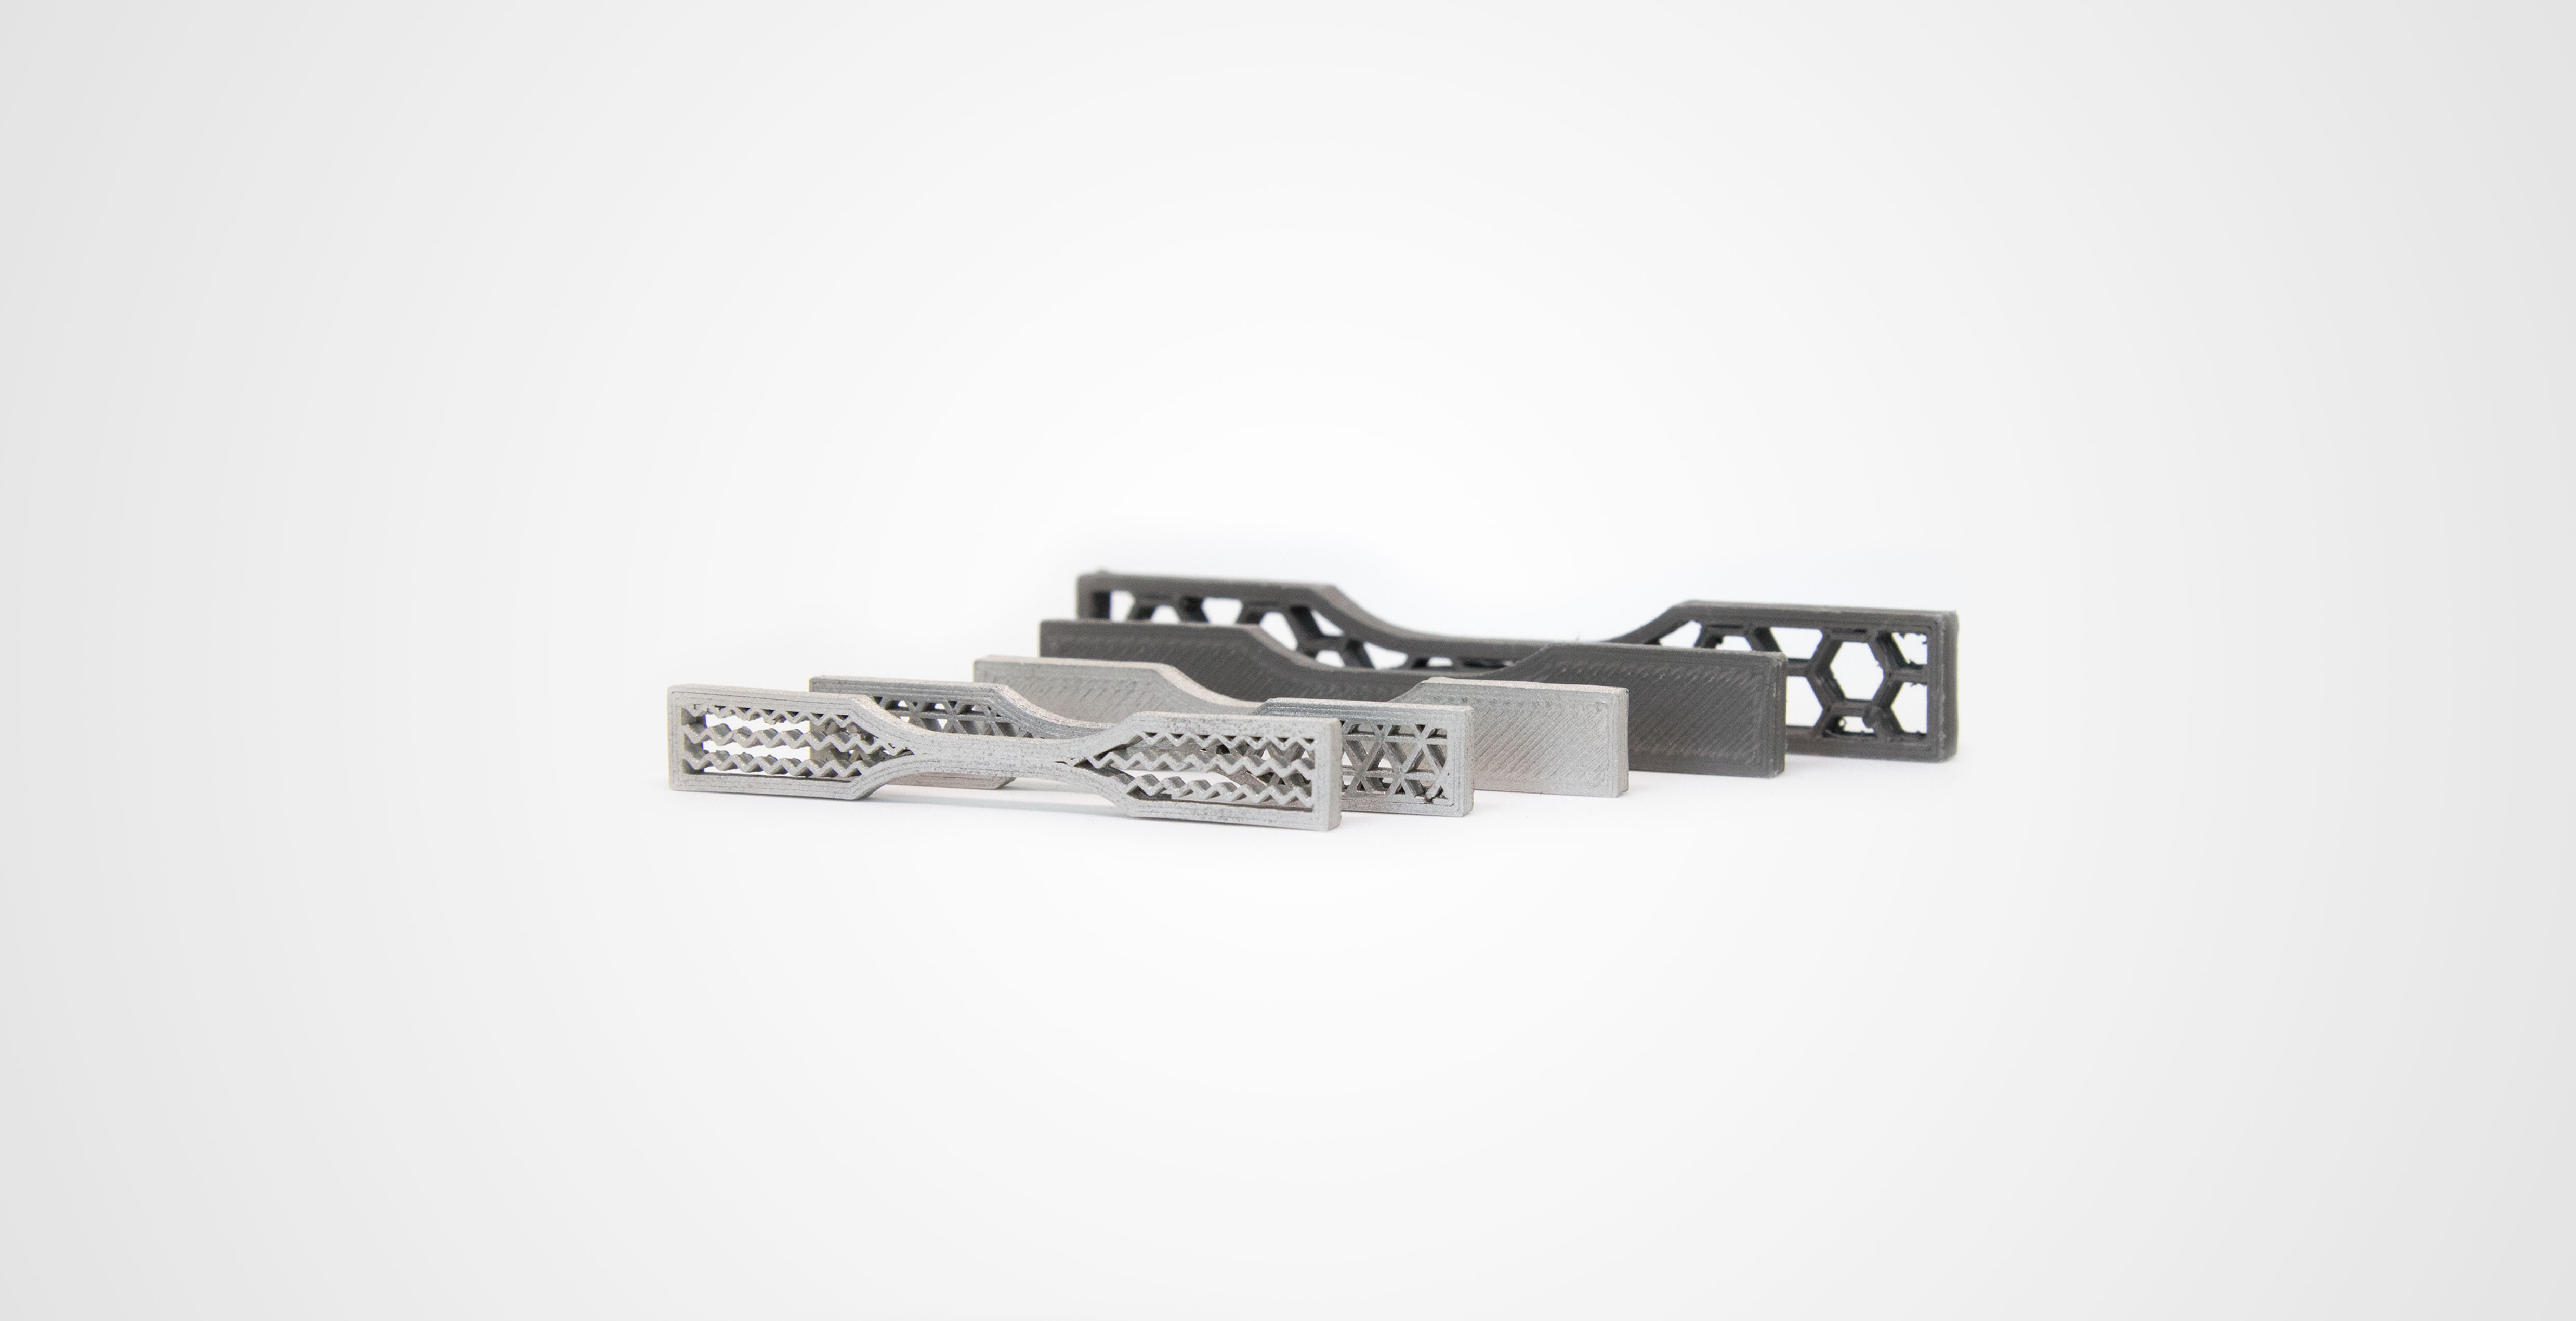 Tensilte Tests - Metal 3D Printing - Apium P220